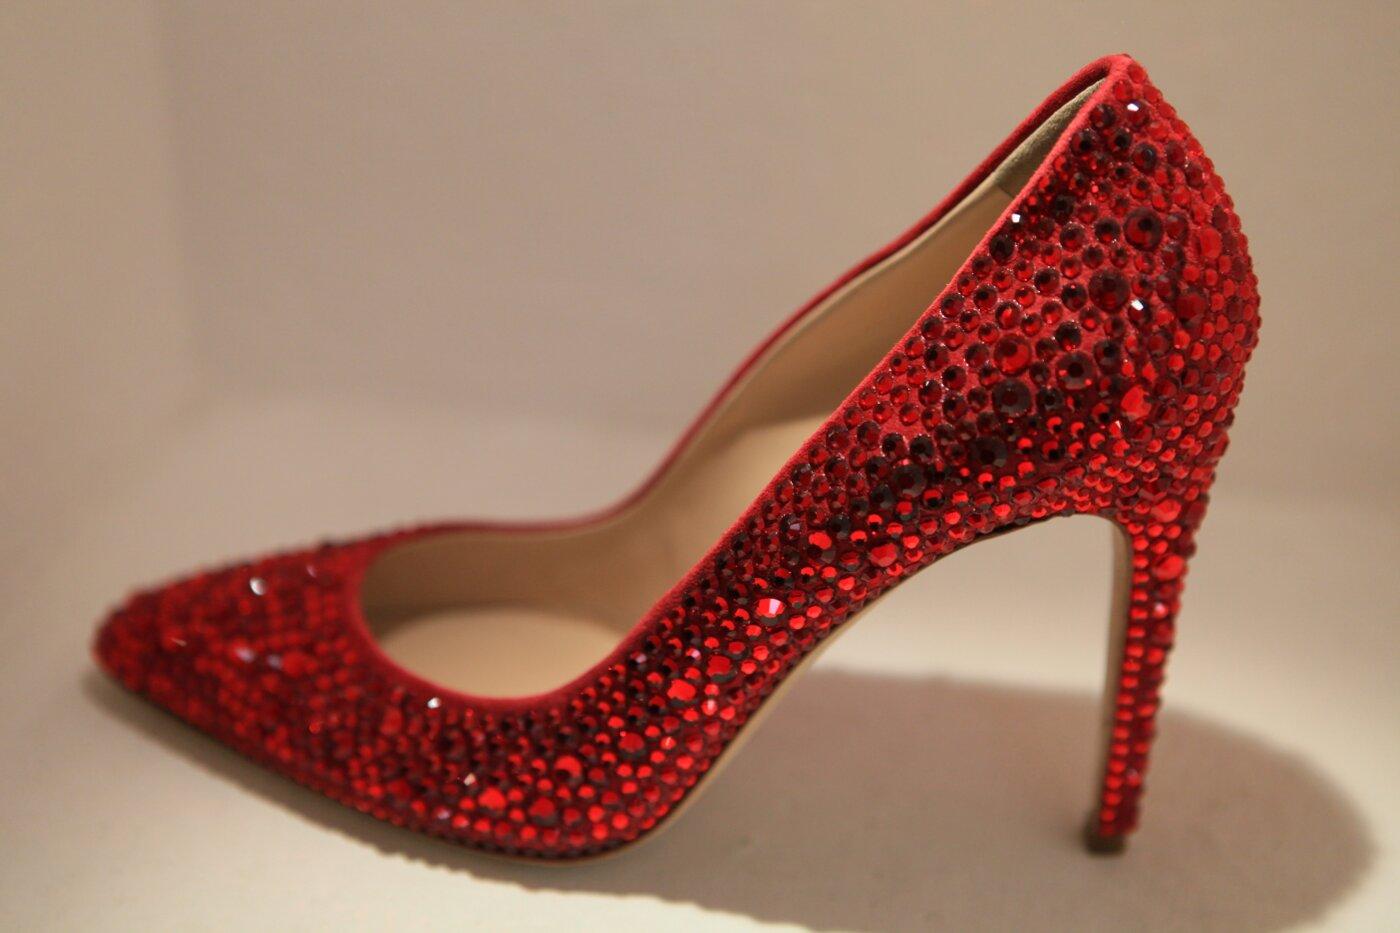 Shoe Max Kibardin - Spring Summer 2012 Shoe